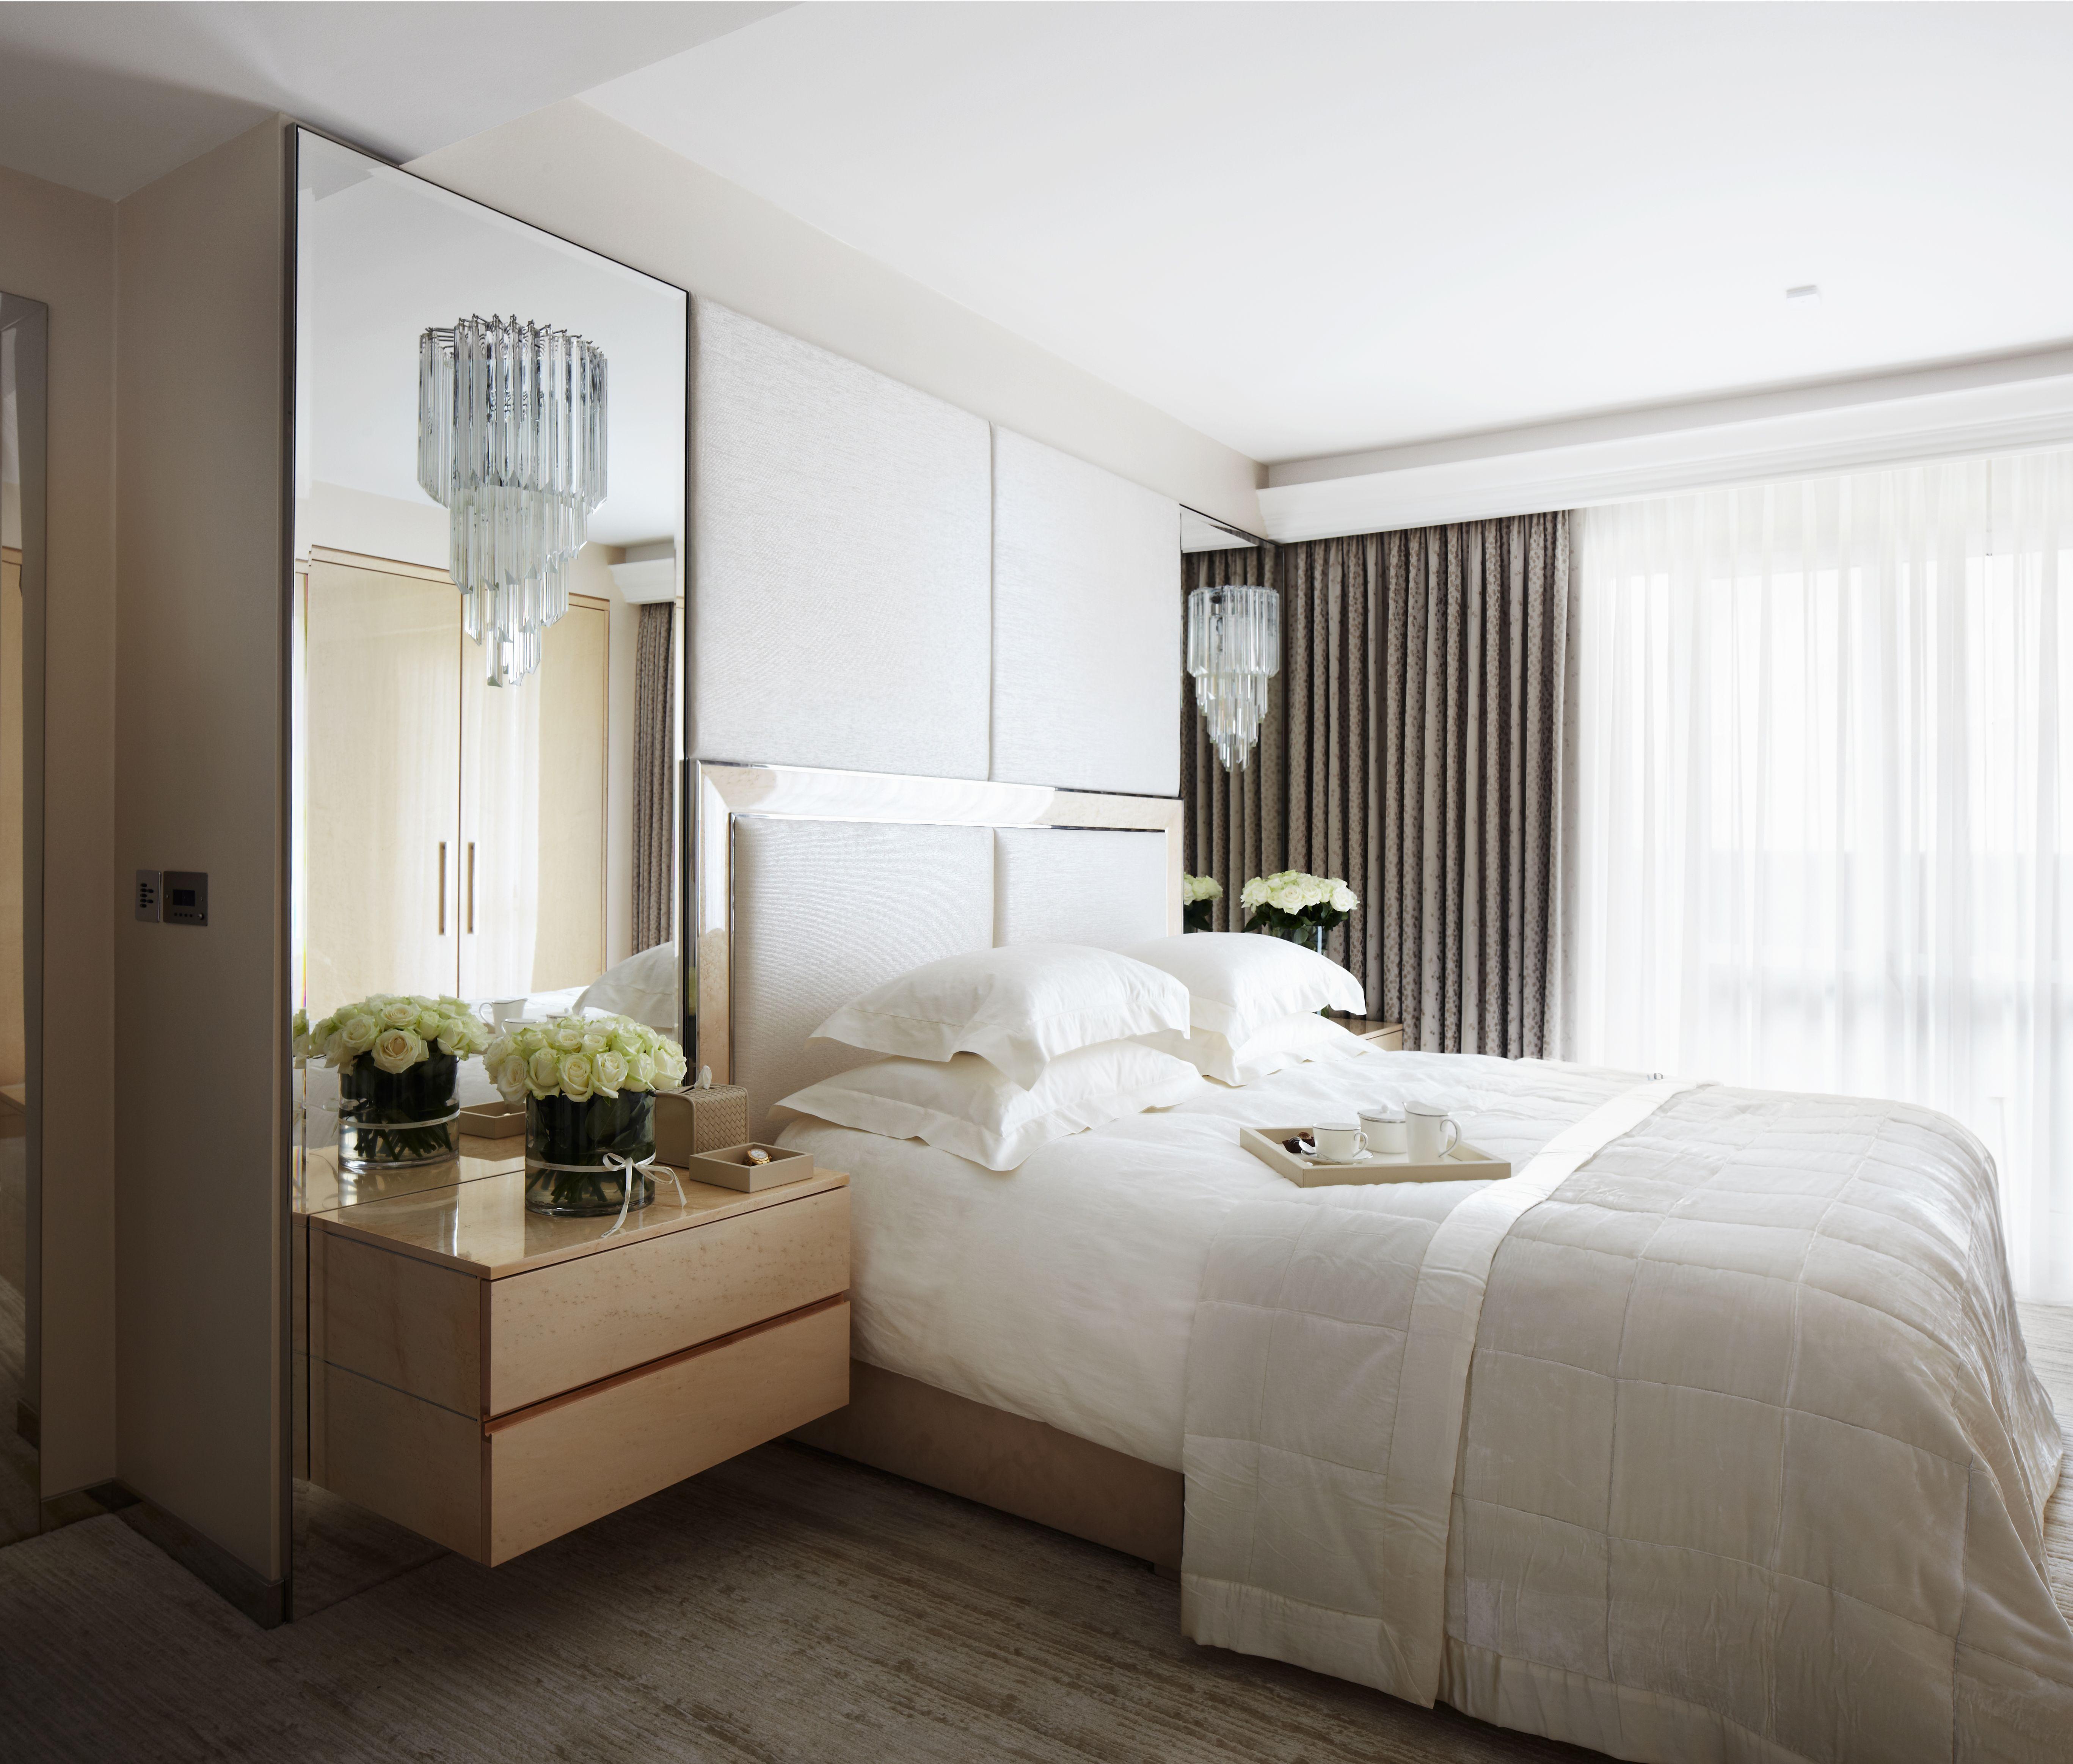 kelly hoppen bedroom - Google Search | Дизайн спален ...